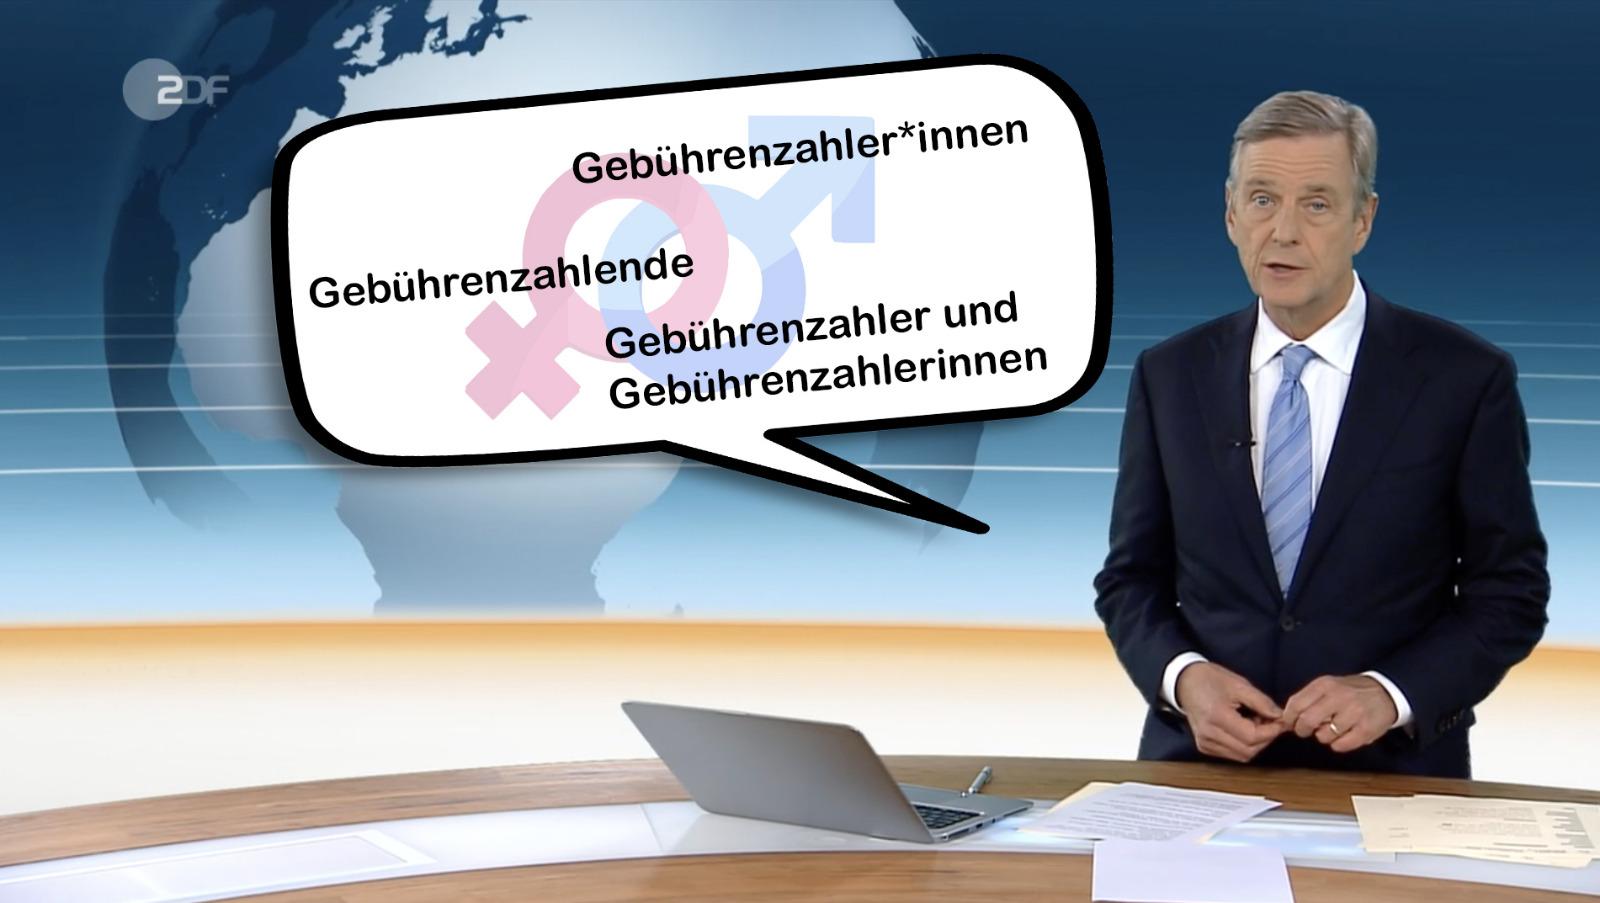 Gender ZDF